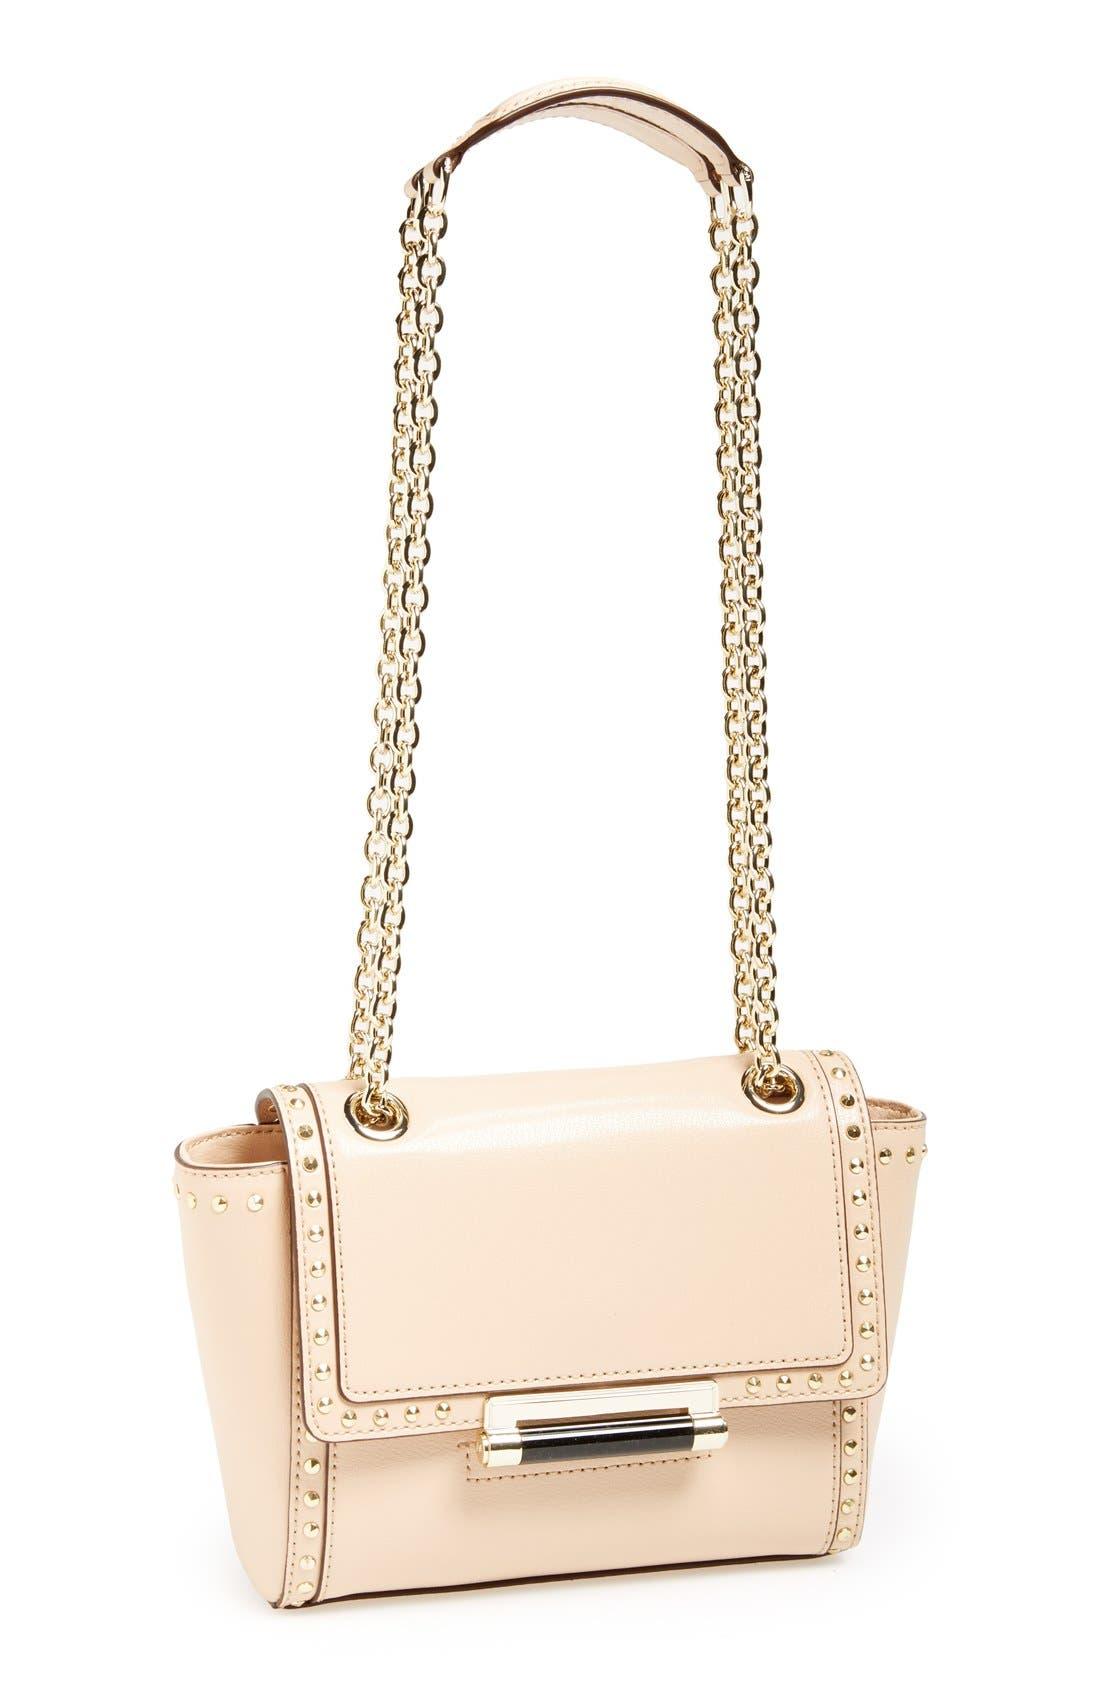 Main Image - Diane von Furstenberg 'Mini 440' Stud Leather Crossbody Bag